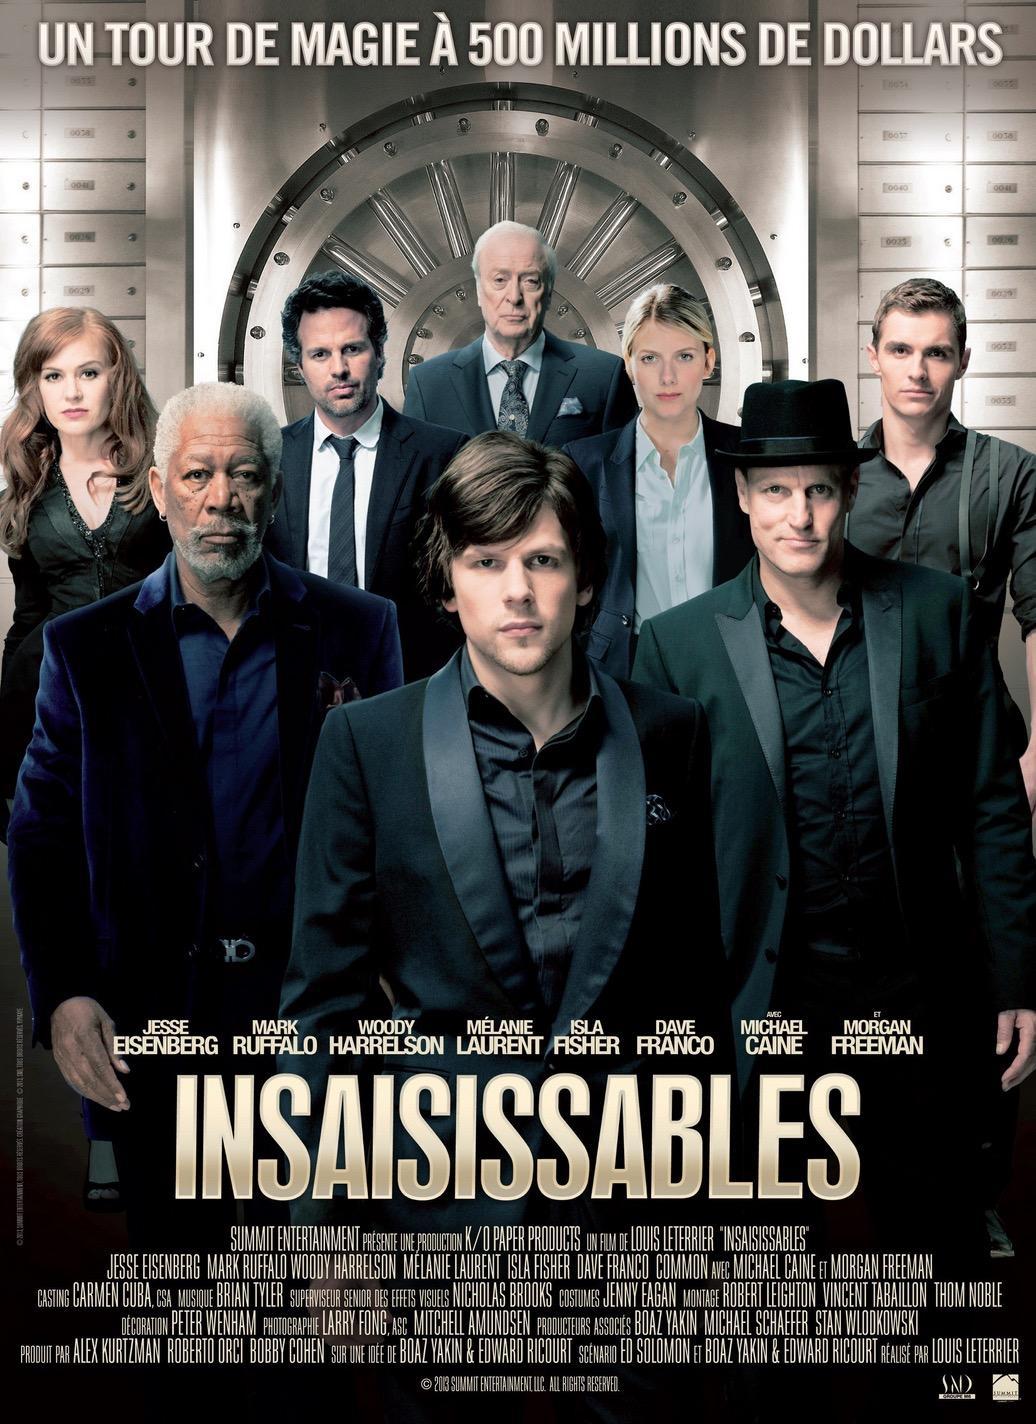 Insaisissables - 2013